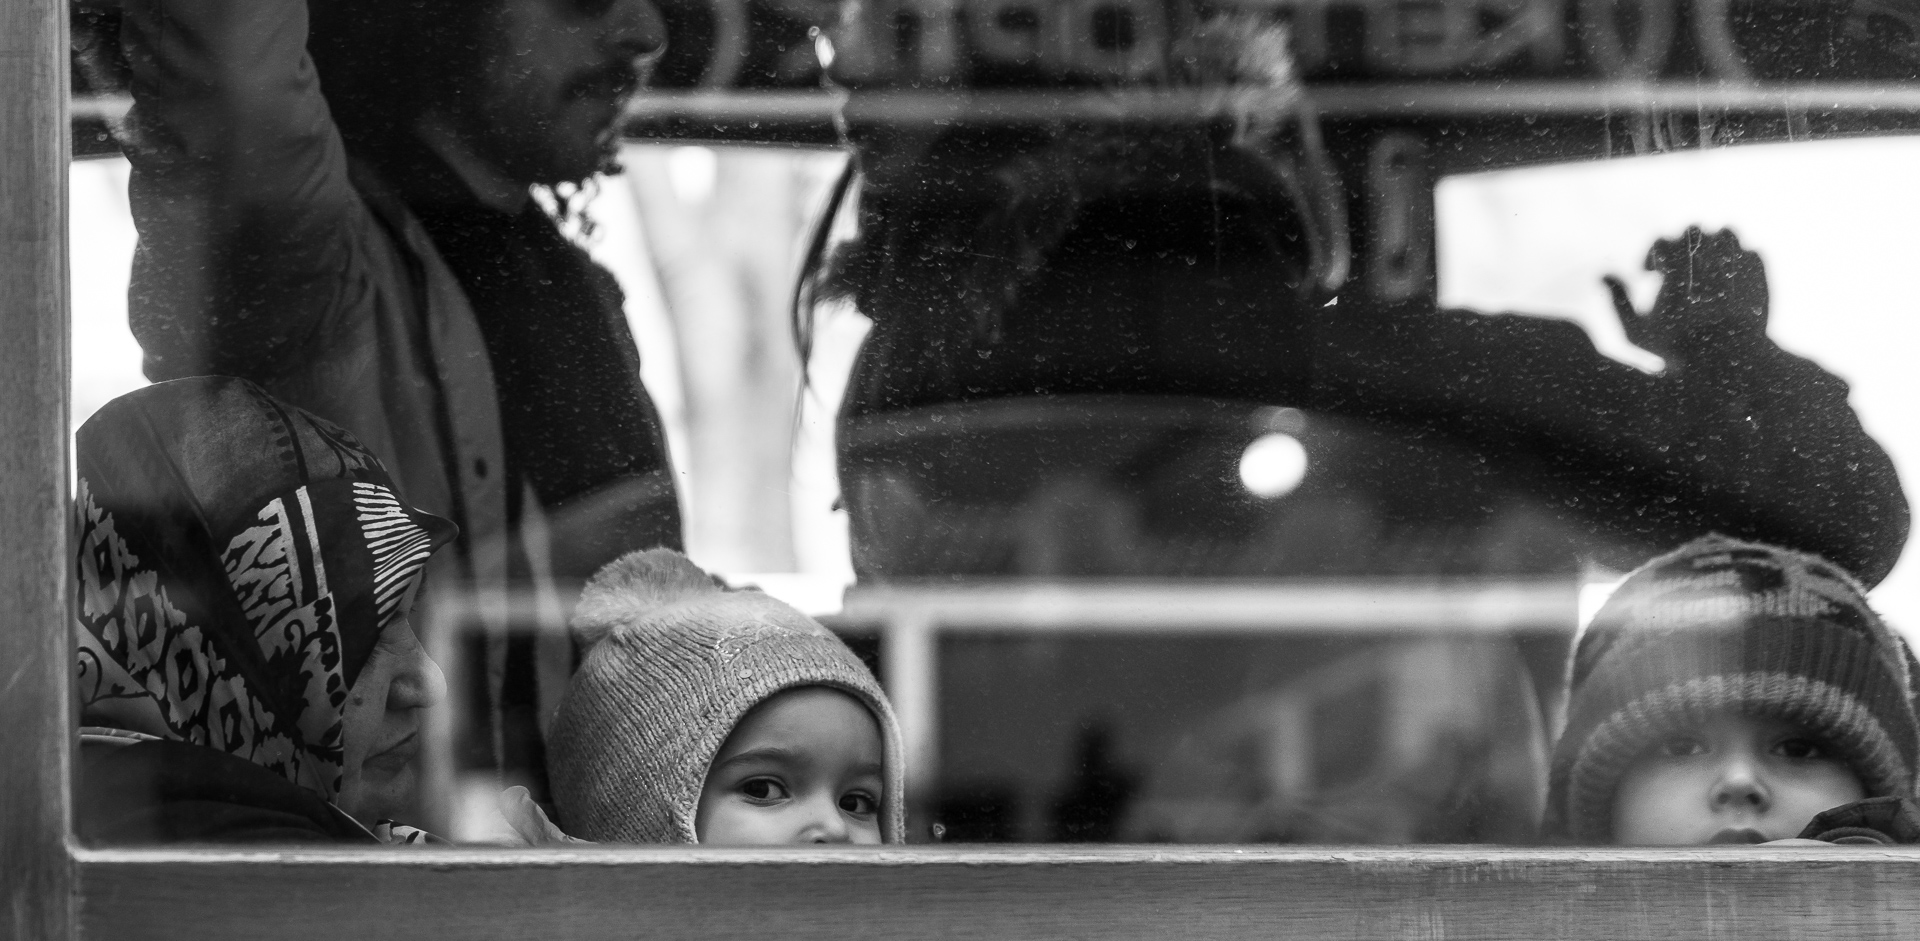 Kids on the Tram by niklin1